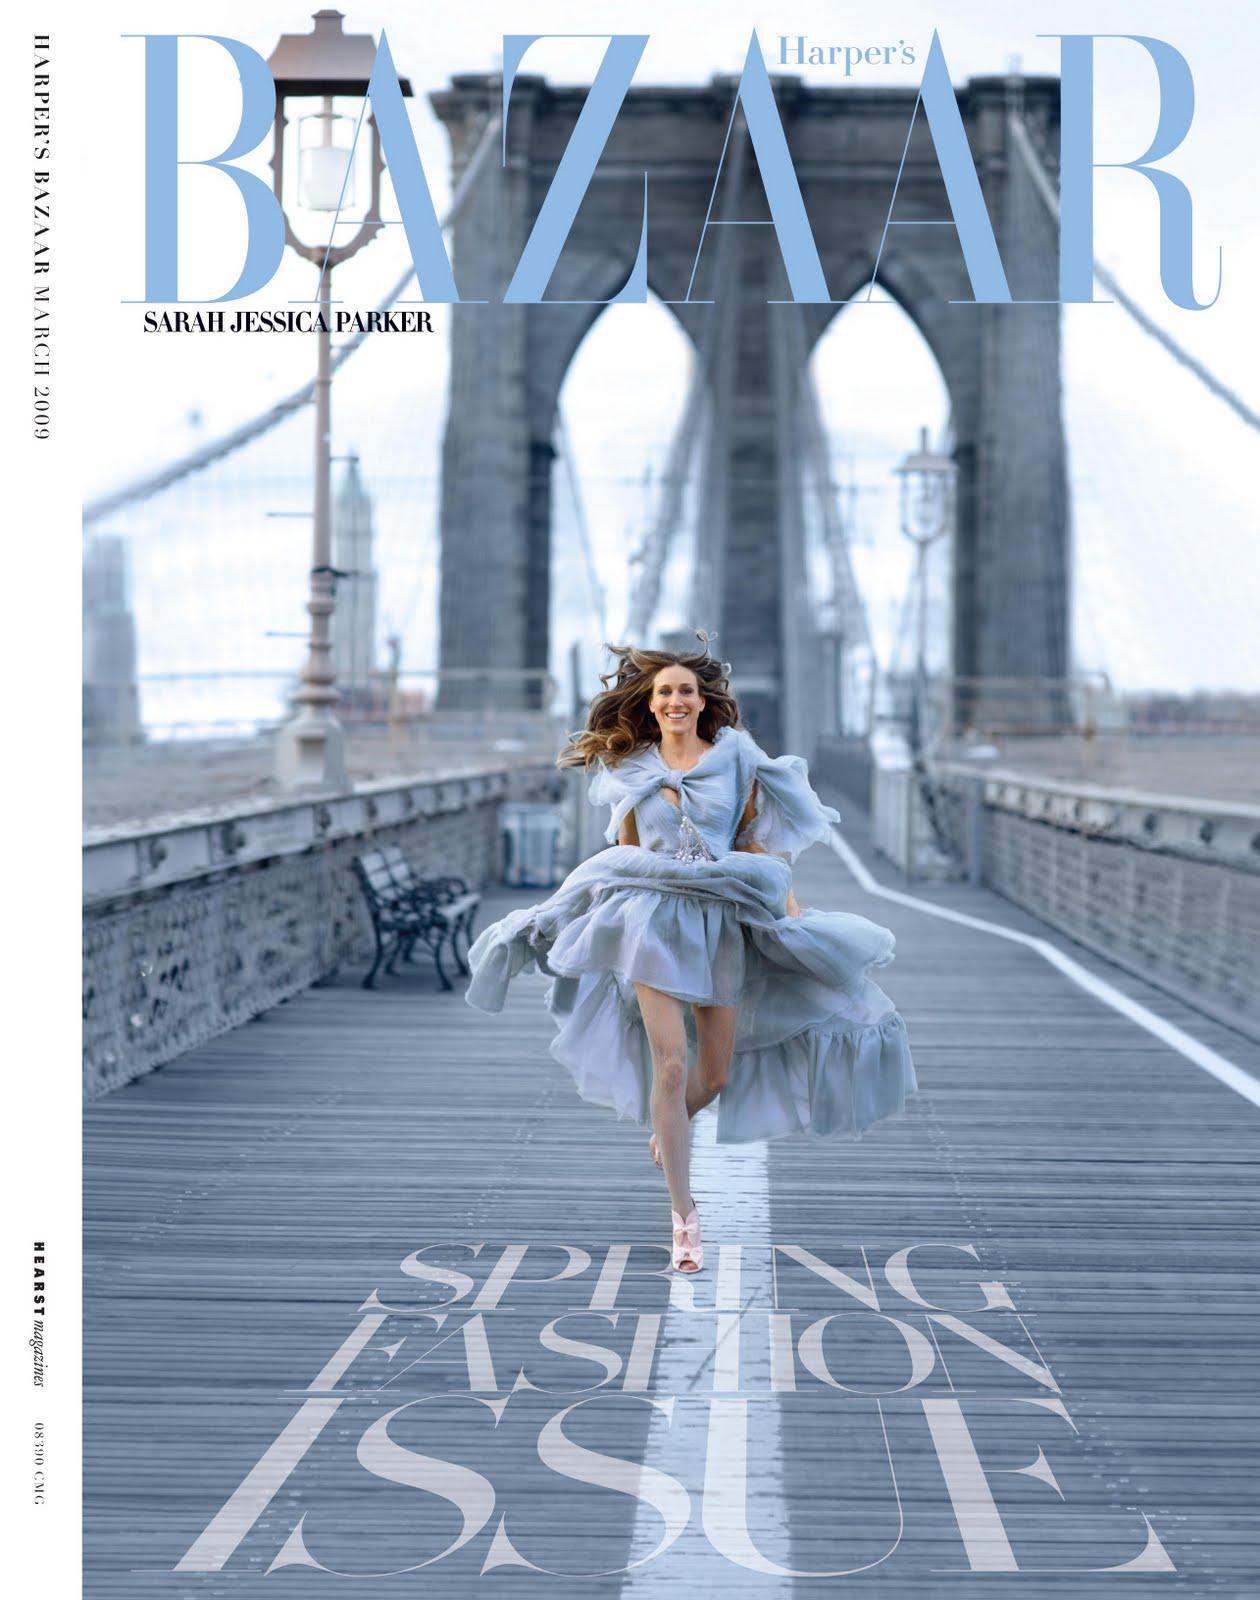 http://4.bp.blogspot.com/_Z_7Utk3YDr8/TQFmxXrzOrI/AAAAAAAABLk/vphEbI02Vlg/s1600/harpers-bazaar-magazine-cover-sarah-jessica-parker.jpg